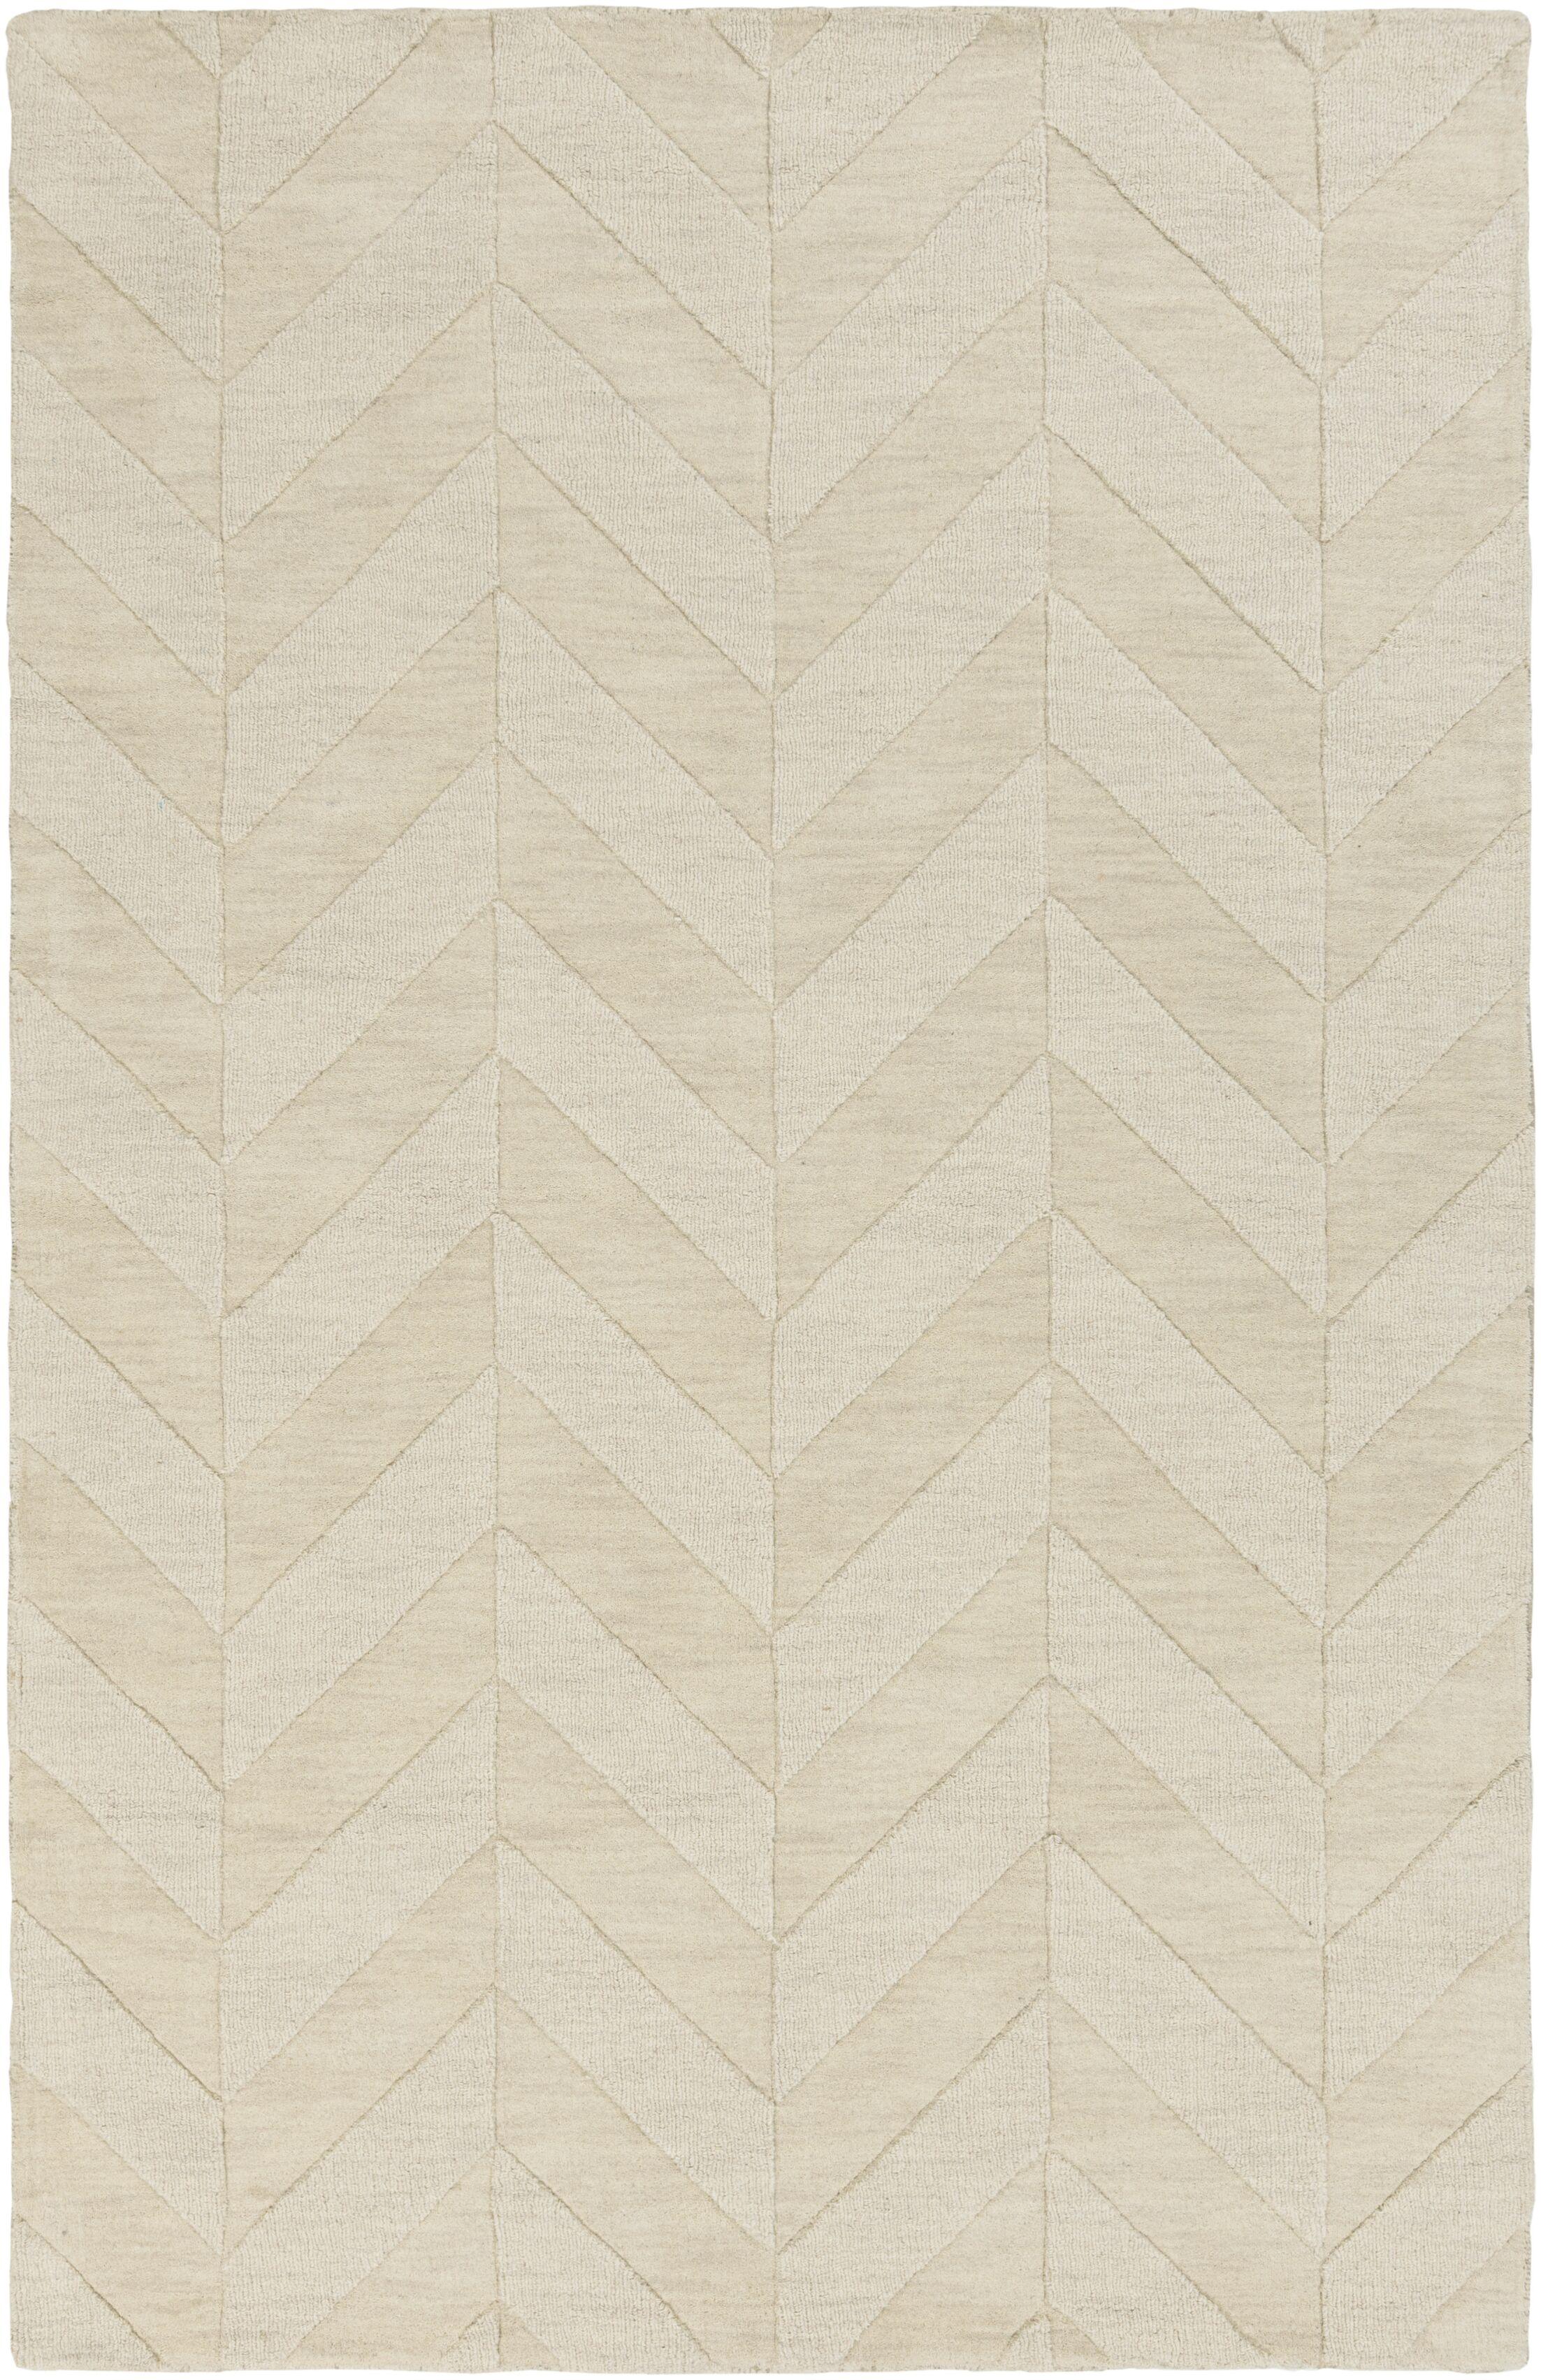 Sunburst Hand-Woven Wool Ivory Area Rug Rug Size: Rectangle 6' x 9'